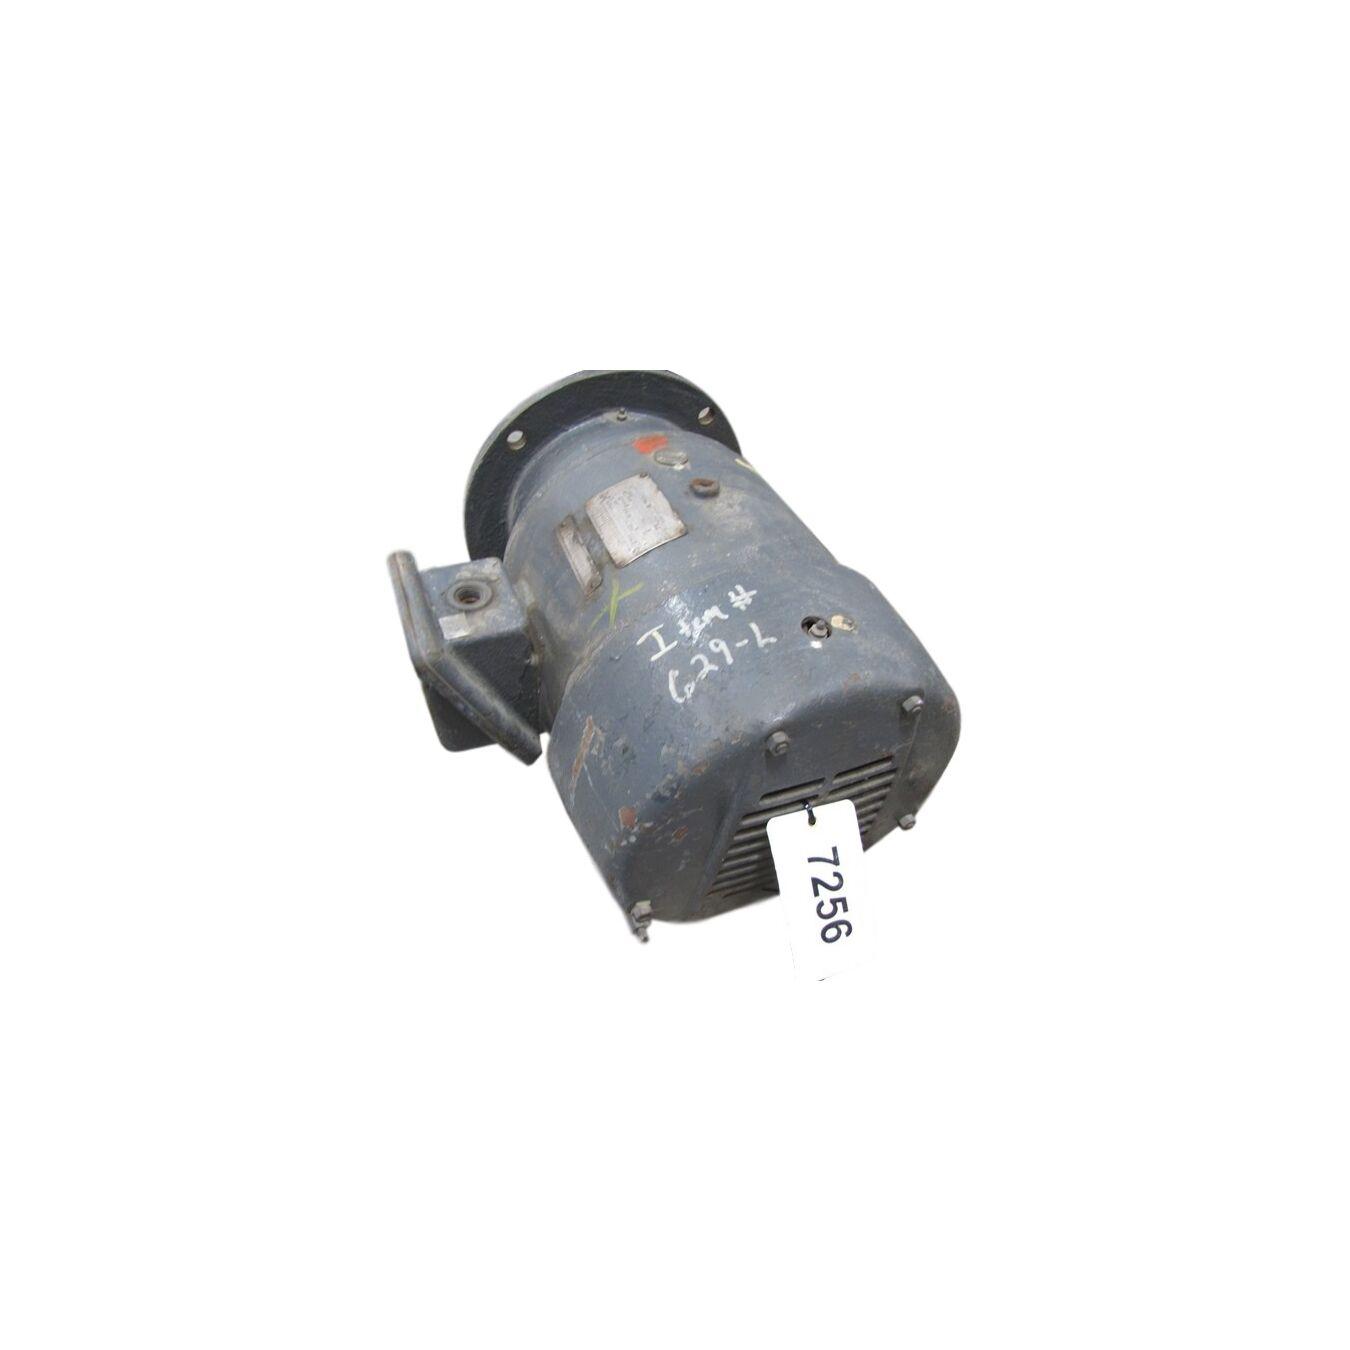 Used Ge 10 Hp Induction Motor 256udz Frame 1760 Rpm